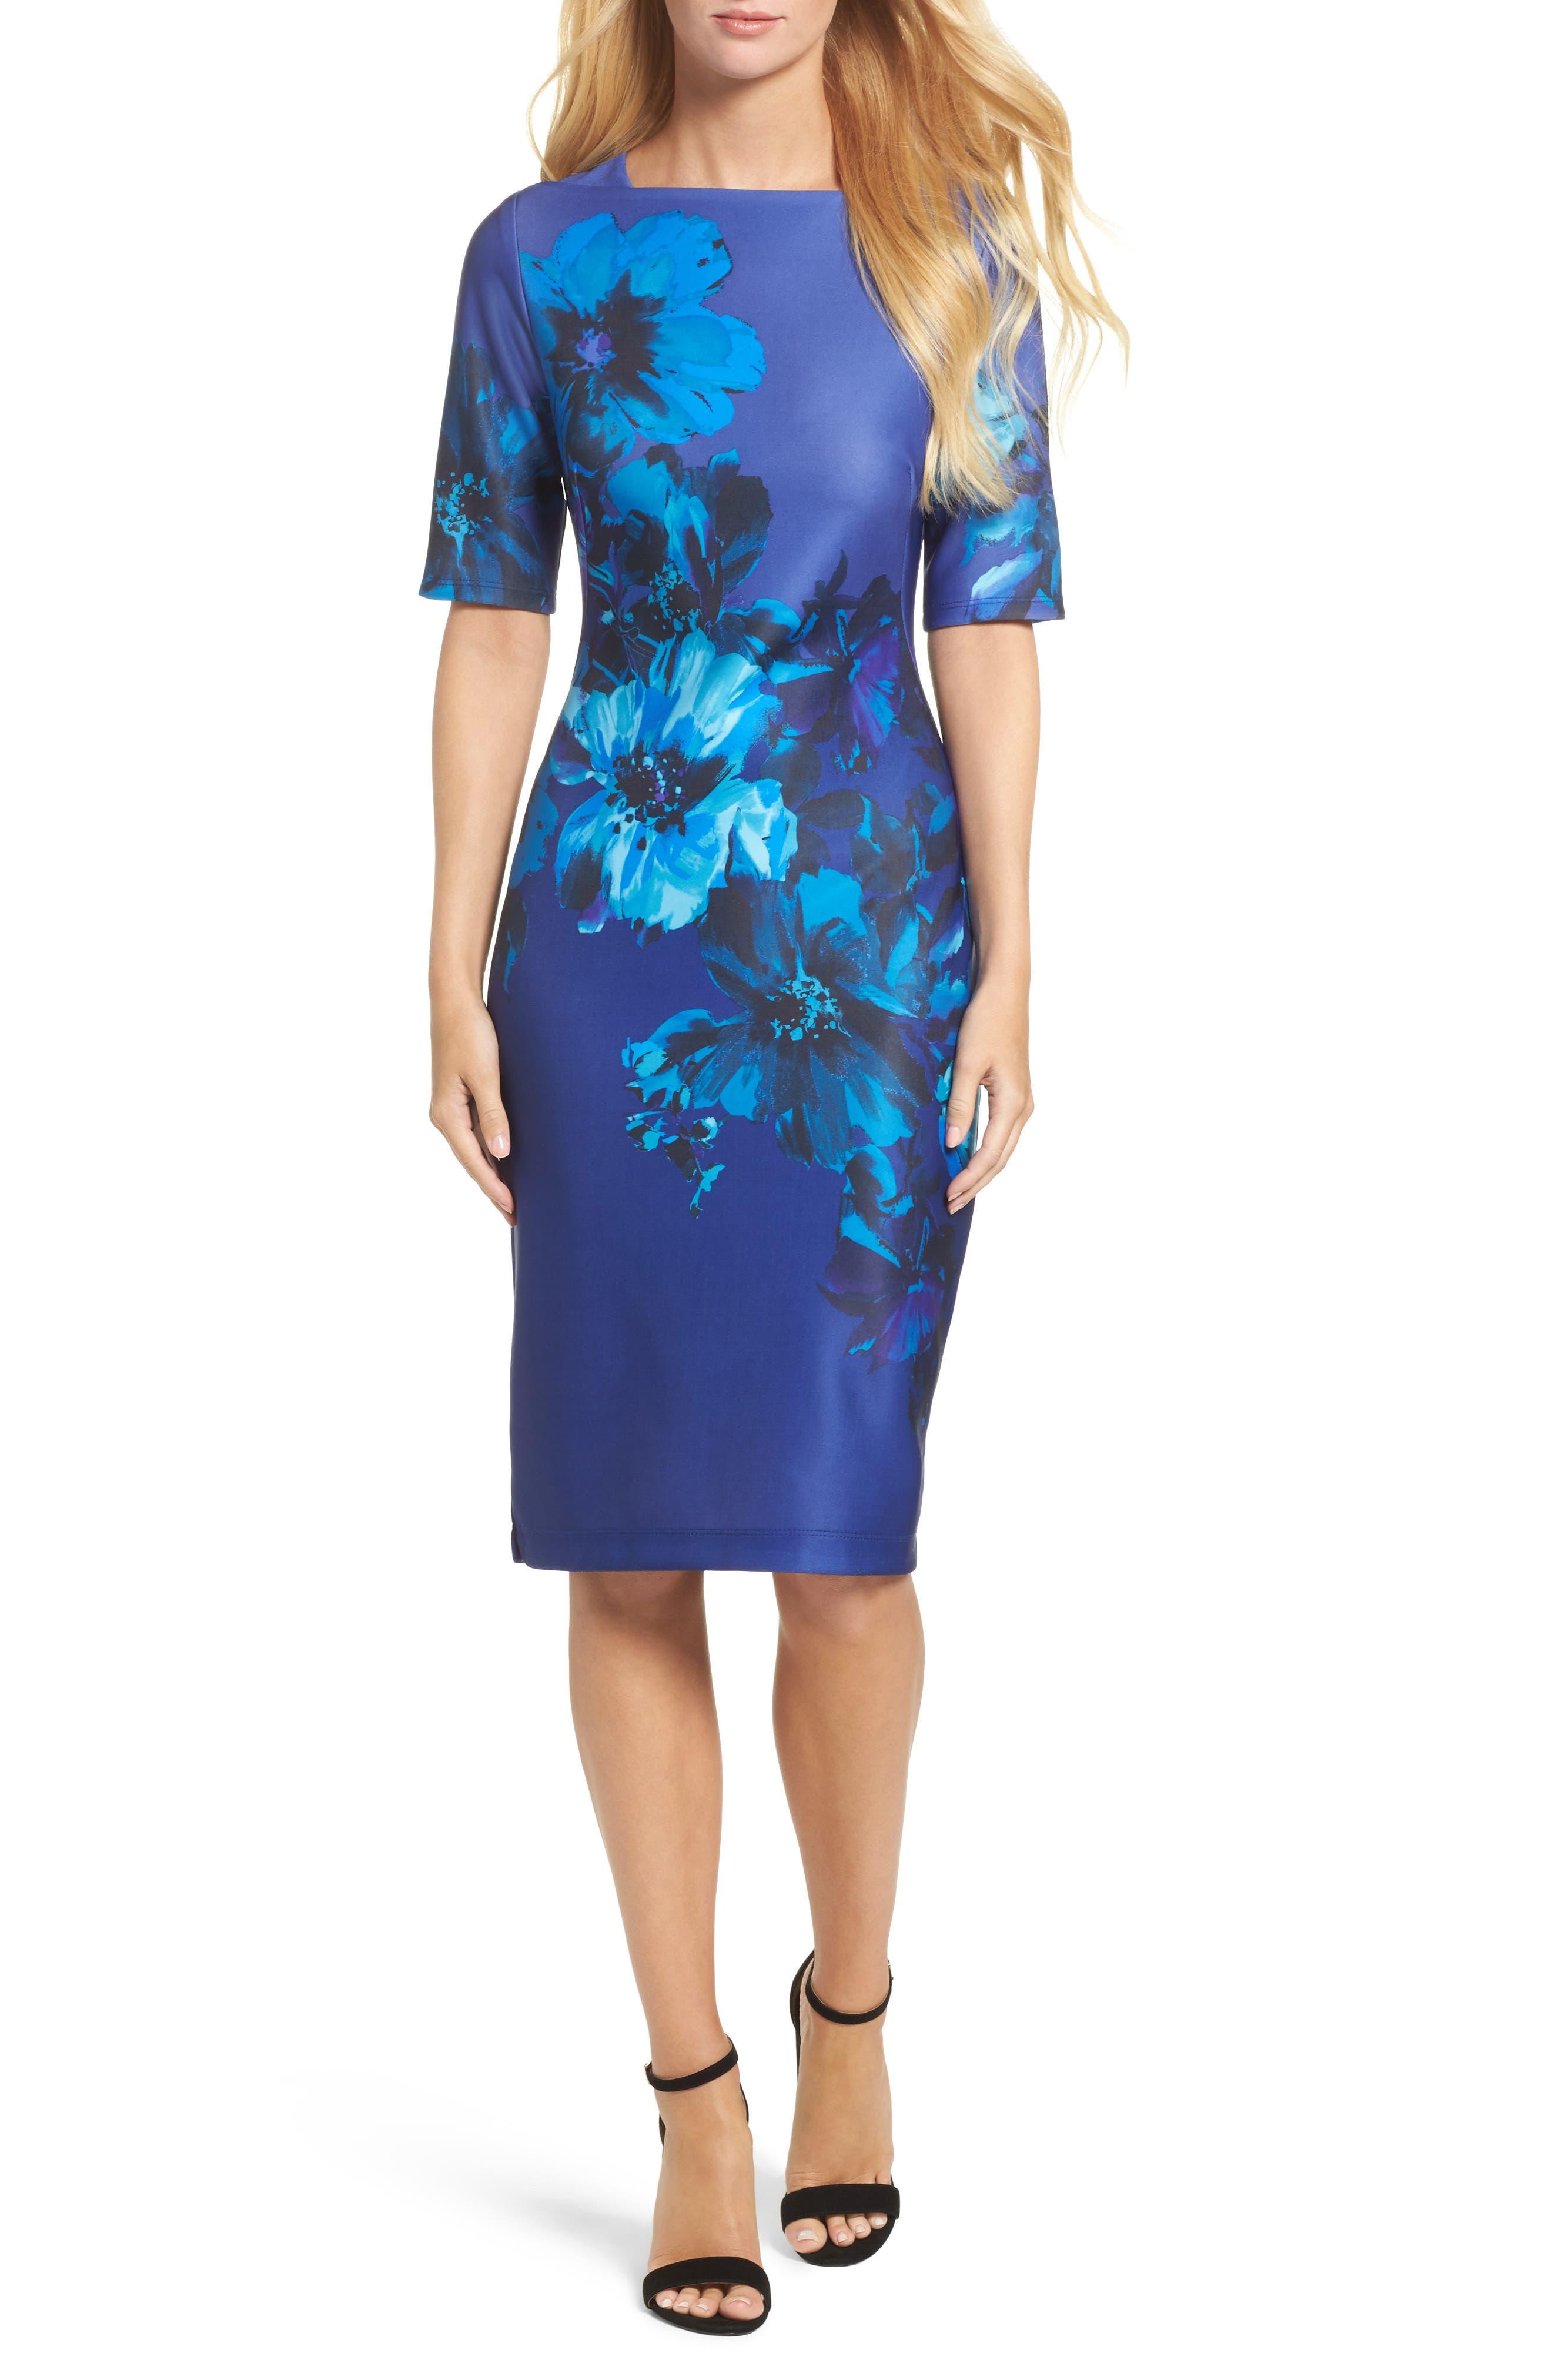 Main Image - Gabby Skye Floral Print Scuba Sheath Dress